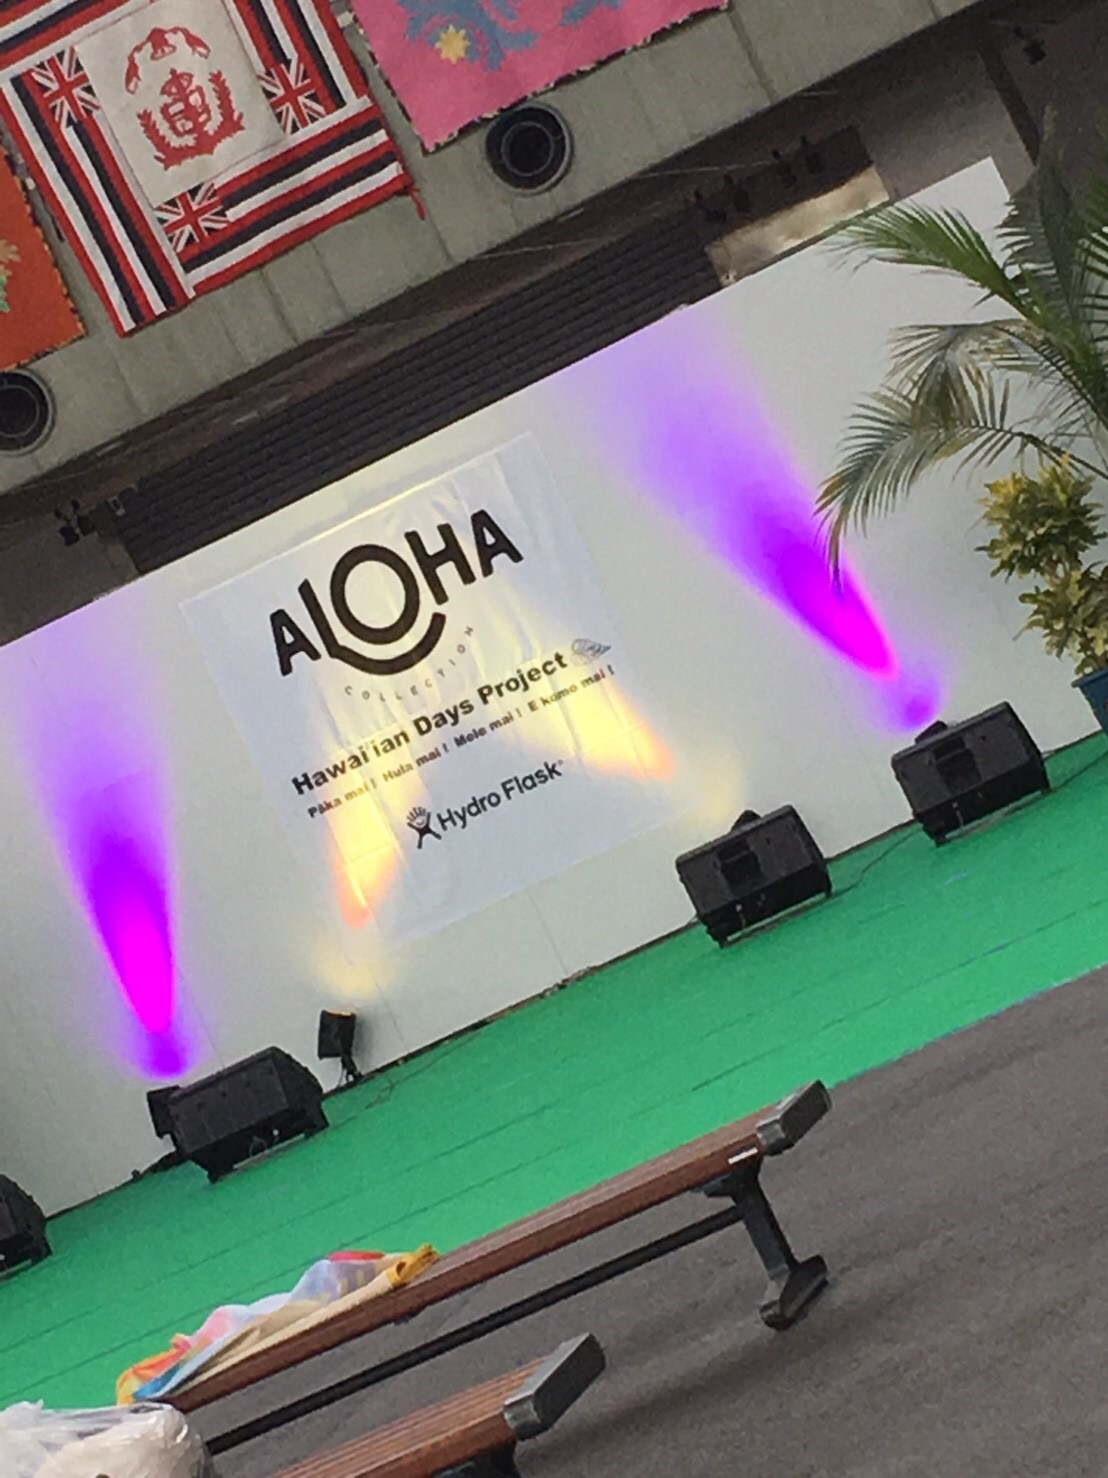 Hawaiʻian WAI KULA Days 2017を開催いたします。